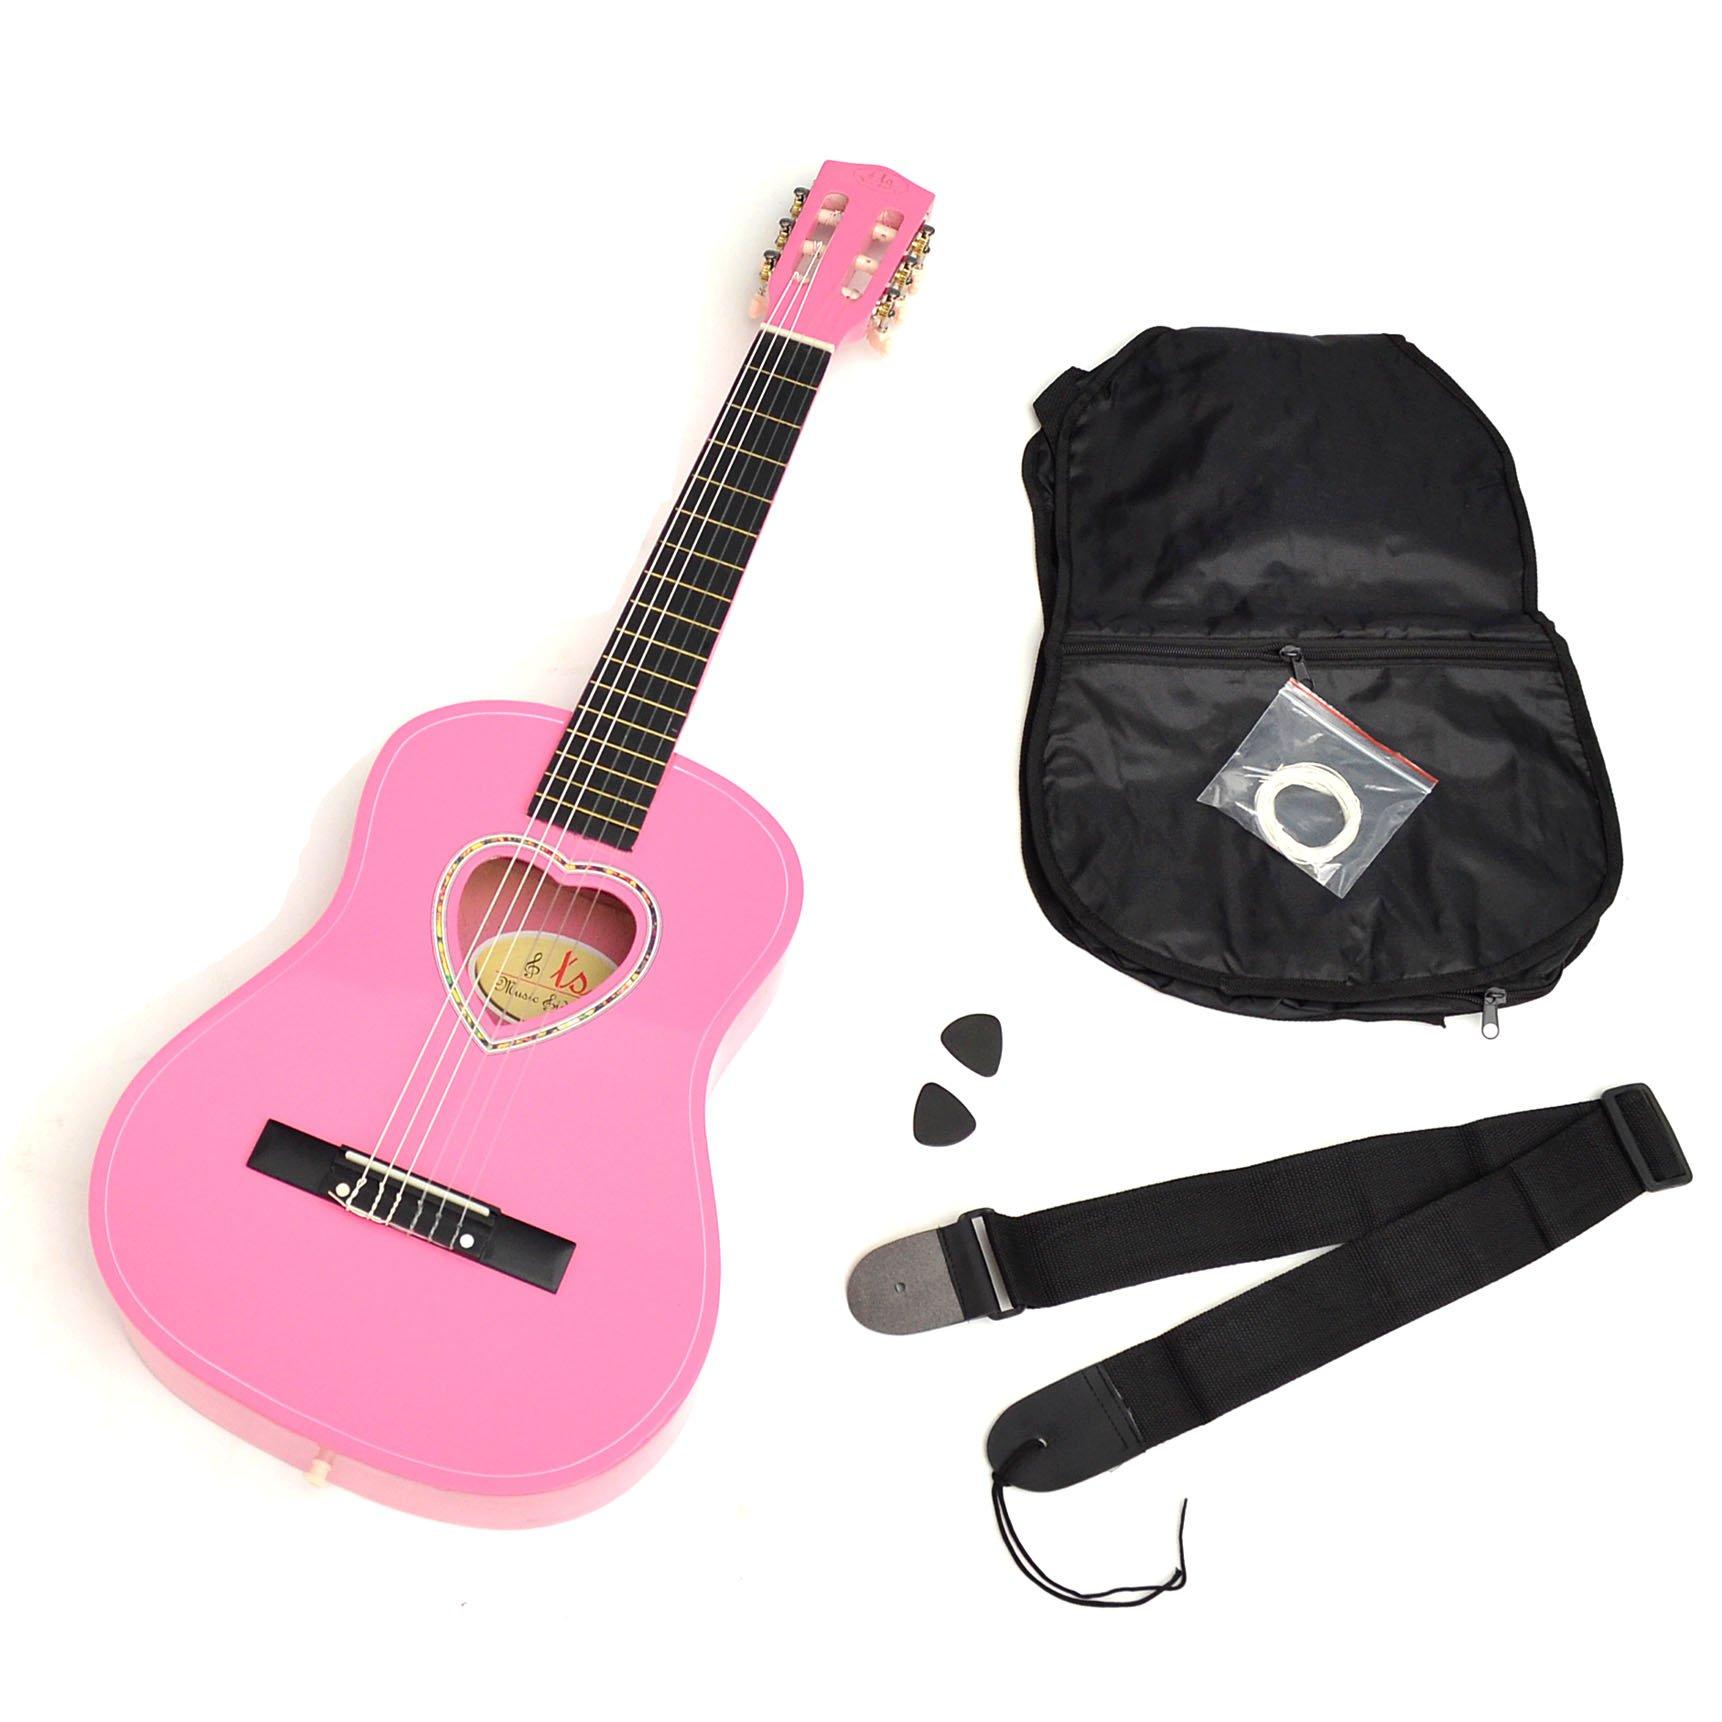 ts-ideen 5260 - Guitarra acústica infantil (tamaño 1/2, pastilla de